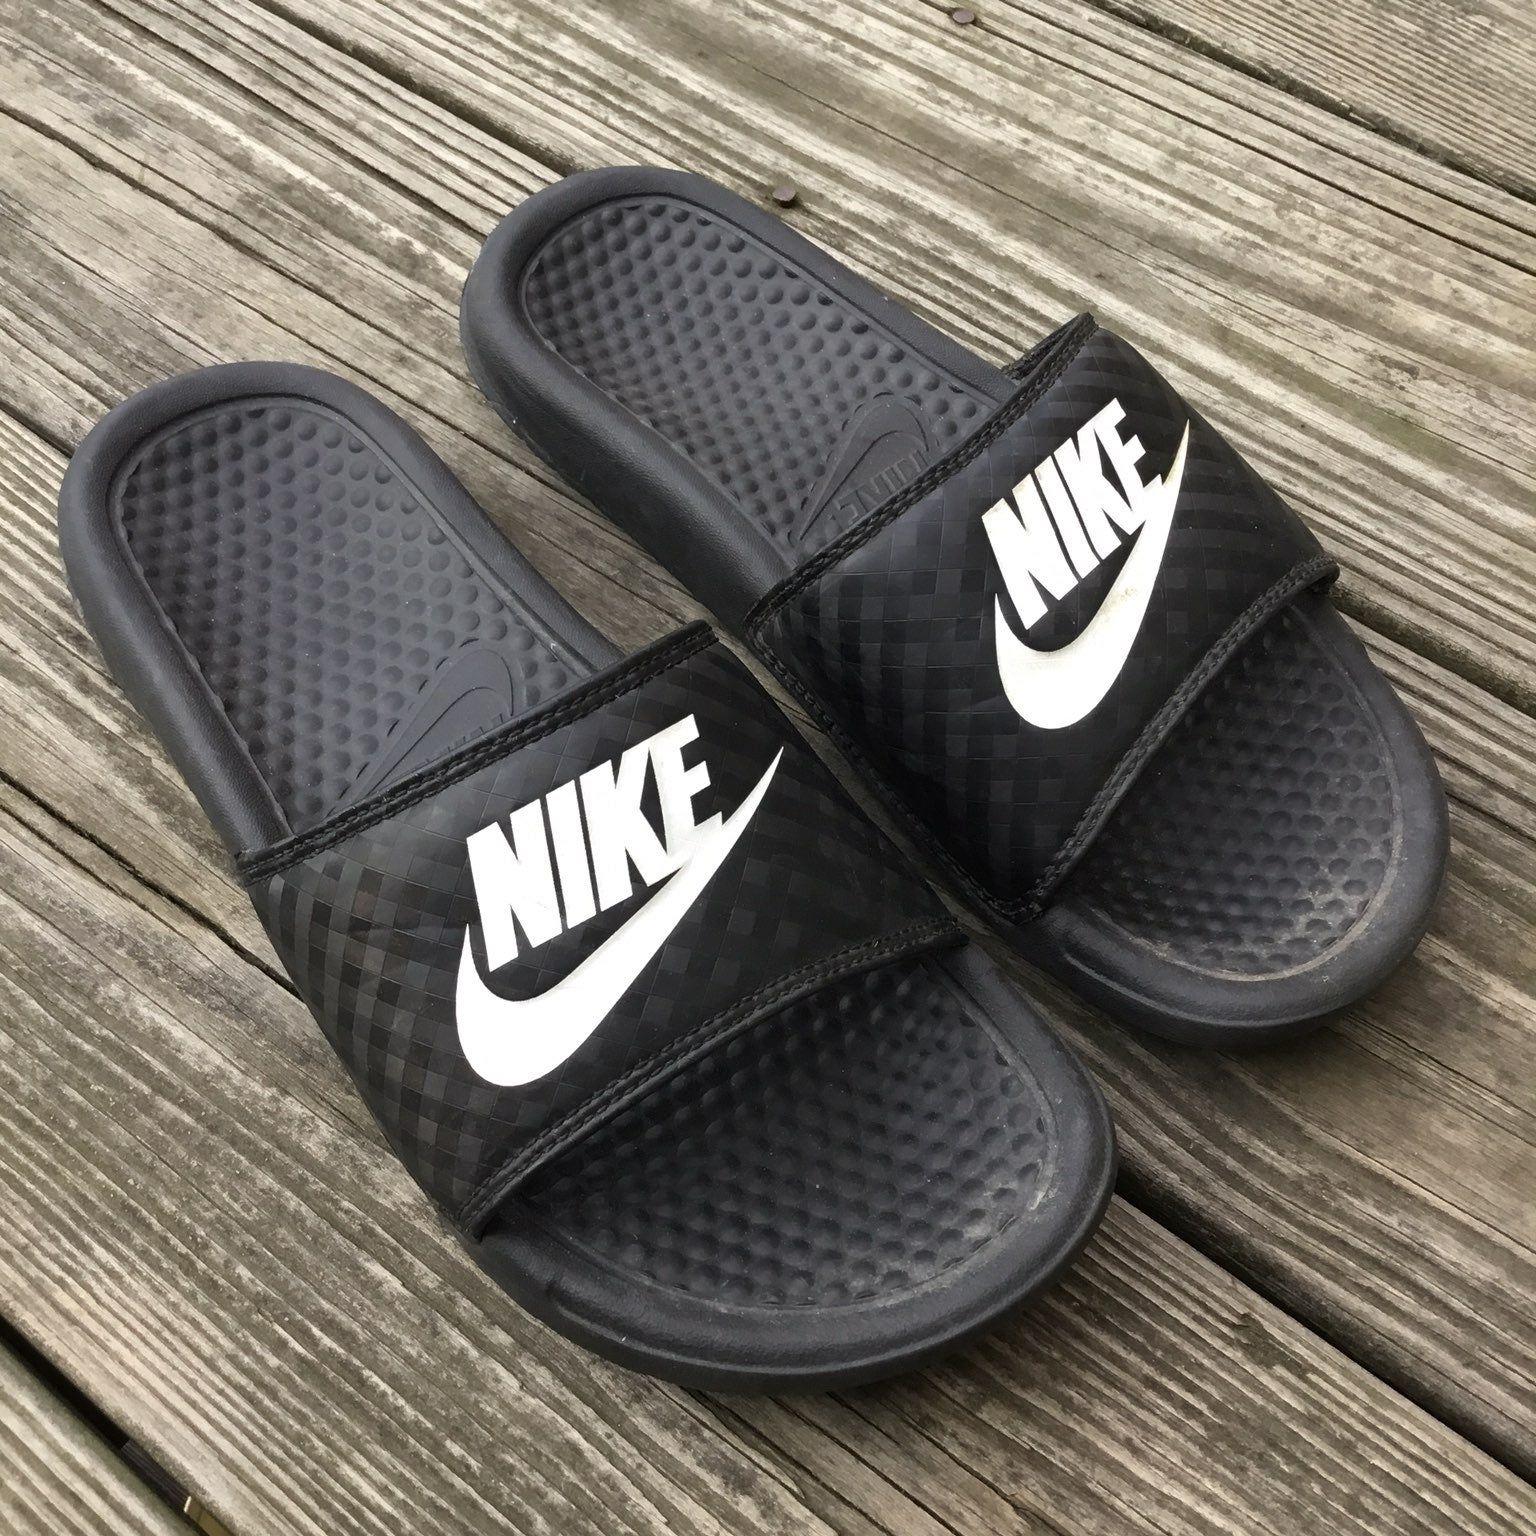 Classic Nike slides Subtle checker